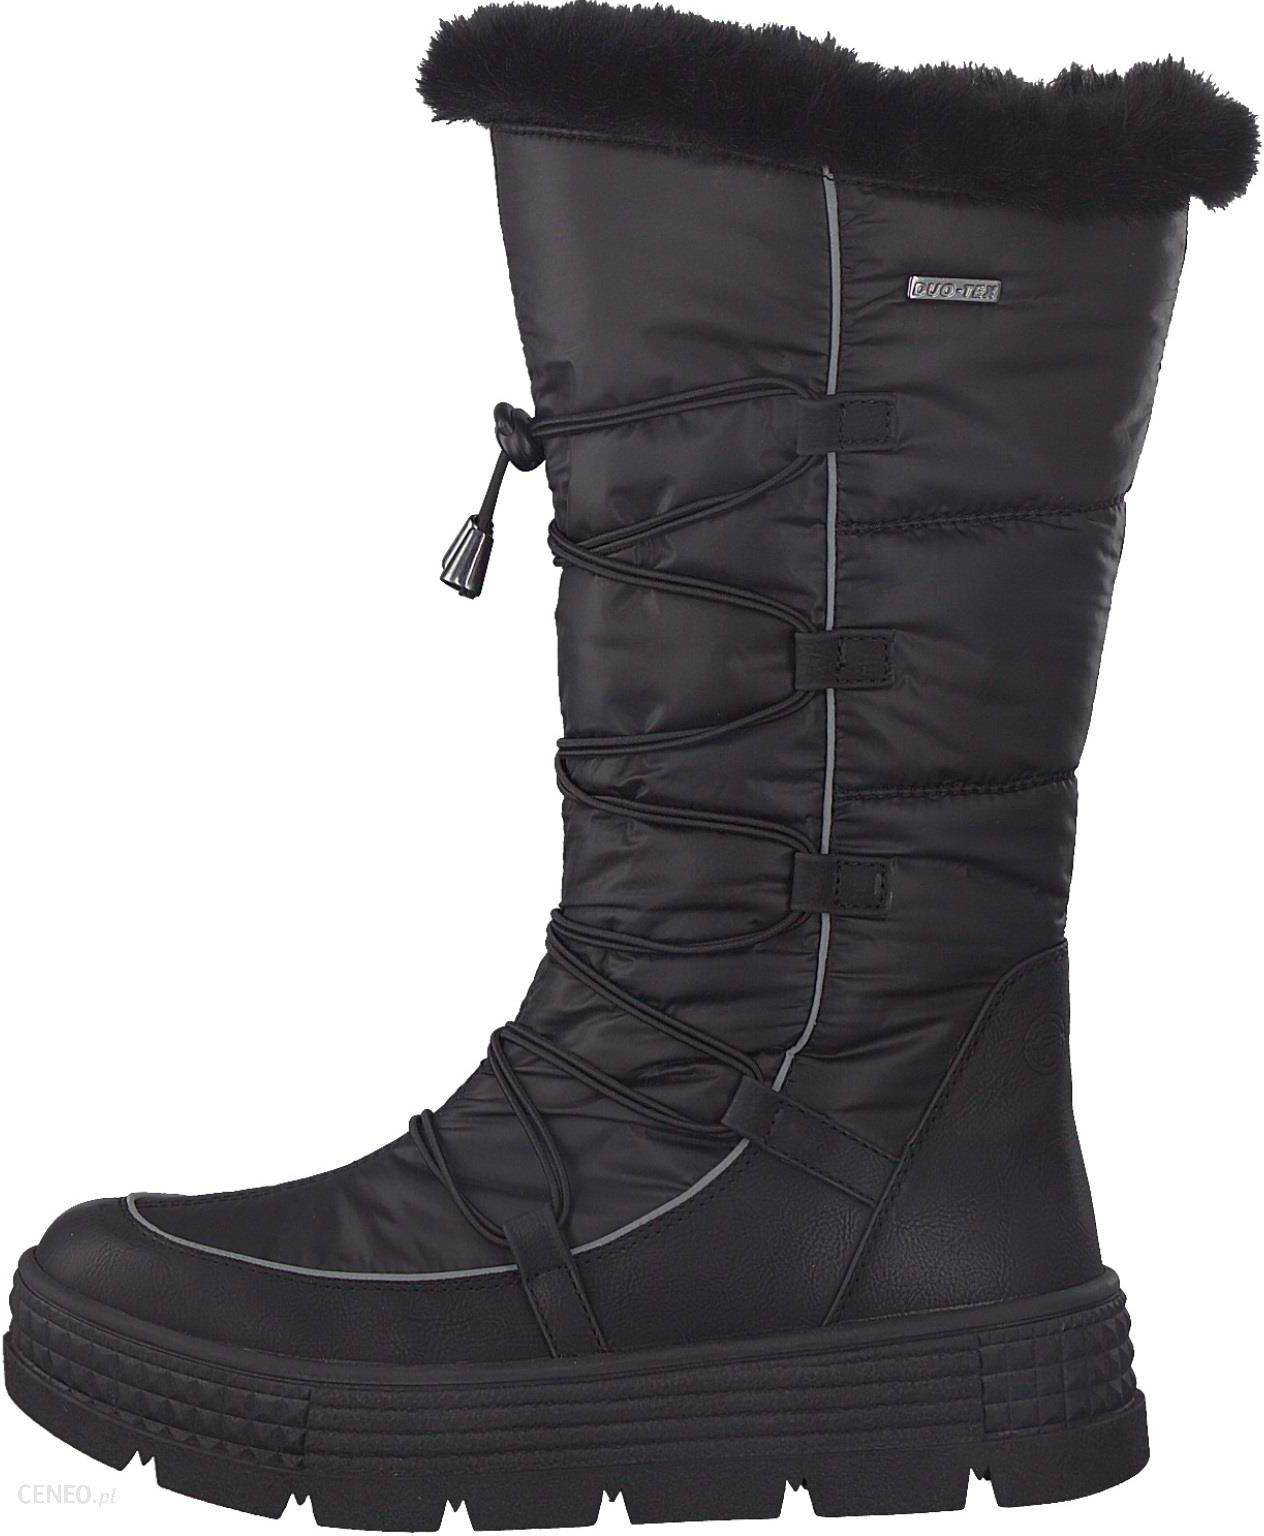 tamaris buty zimowe damskie